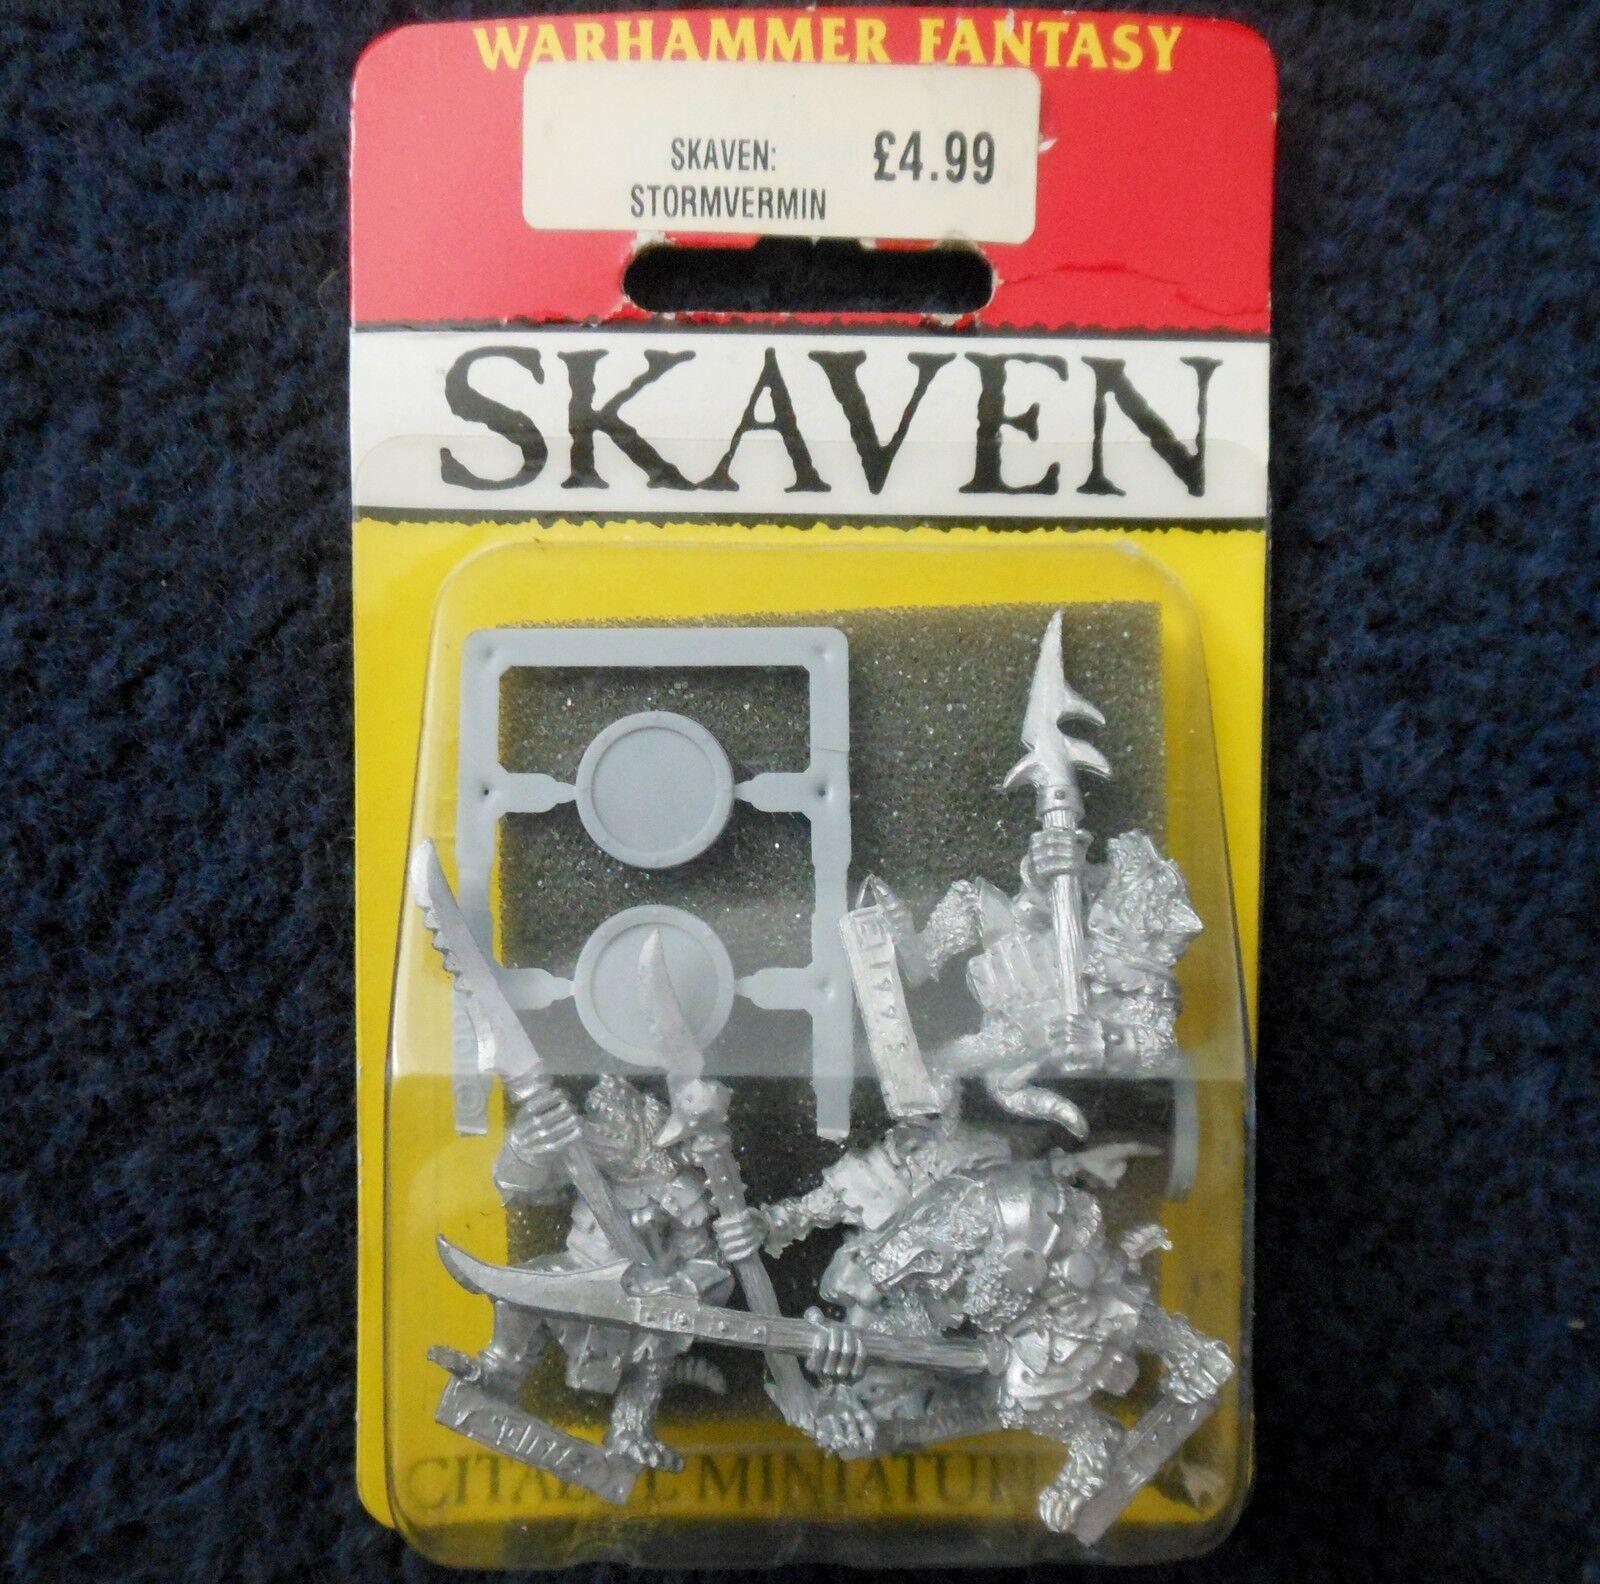 1987 Skaven Stormvermin with Halberd S1 Chaos Ratmen Citadel Warhammer Army MIB